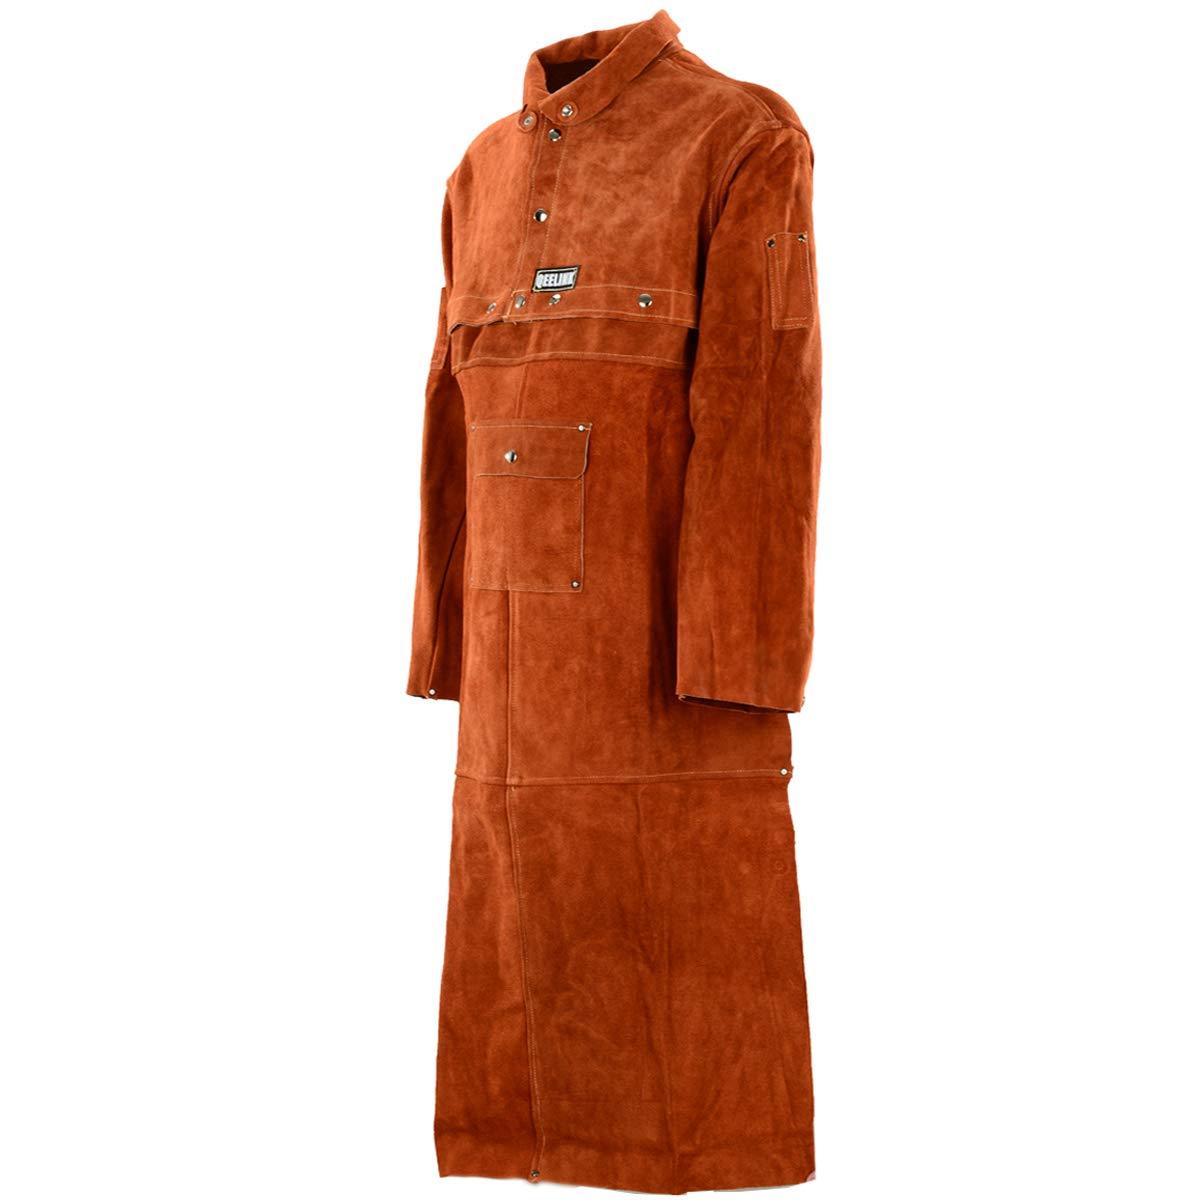 QeeLink Welding Apron with Sleeve - Heavy Duty Leather Flame Resistant Welding Jacket (X-Large)